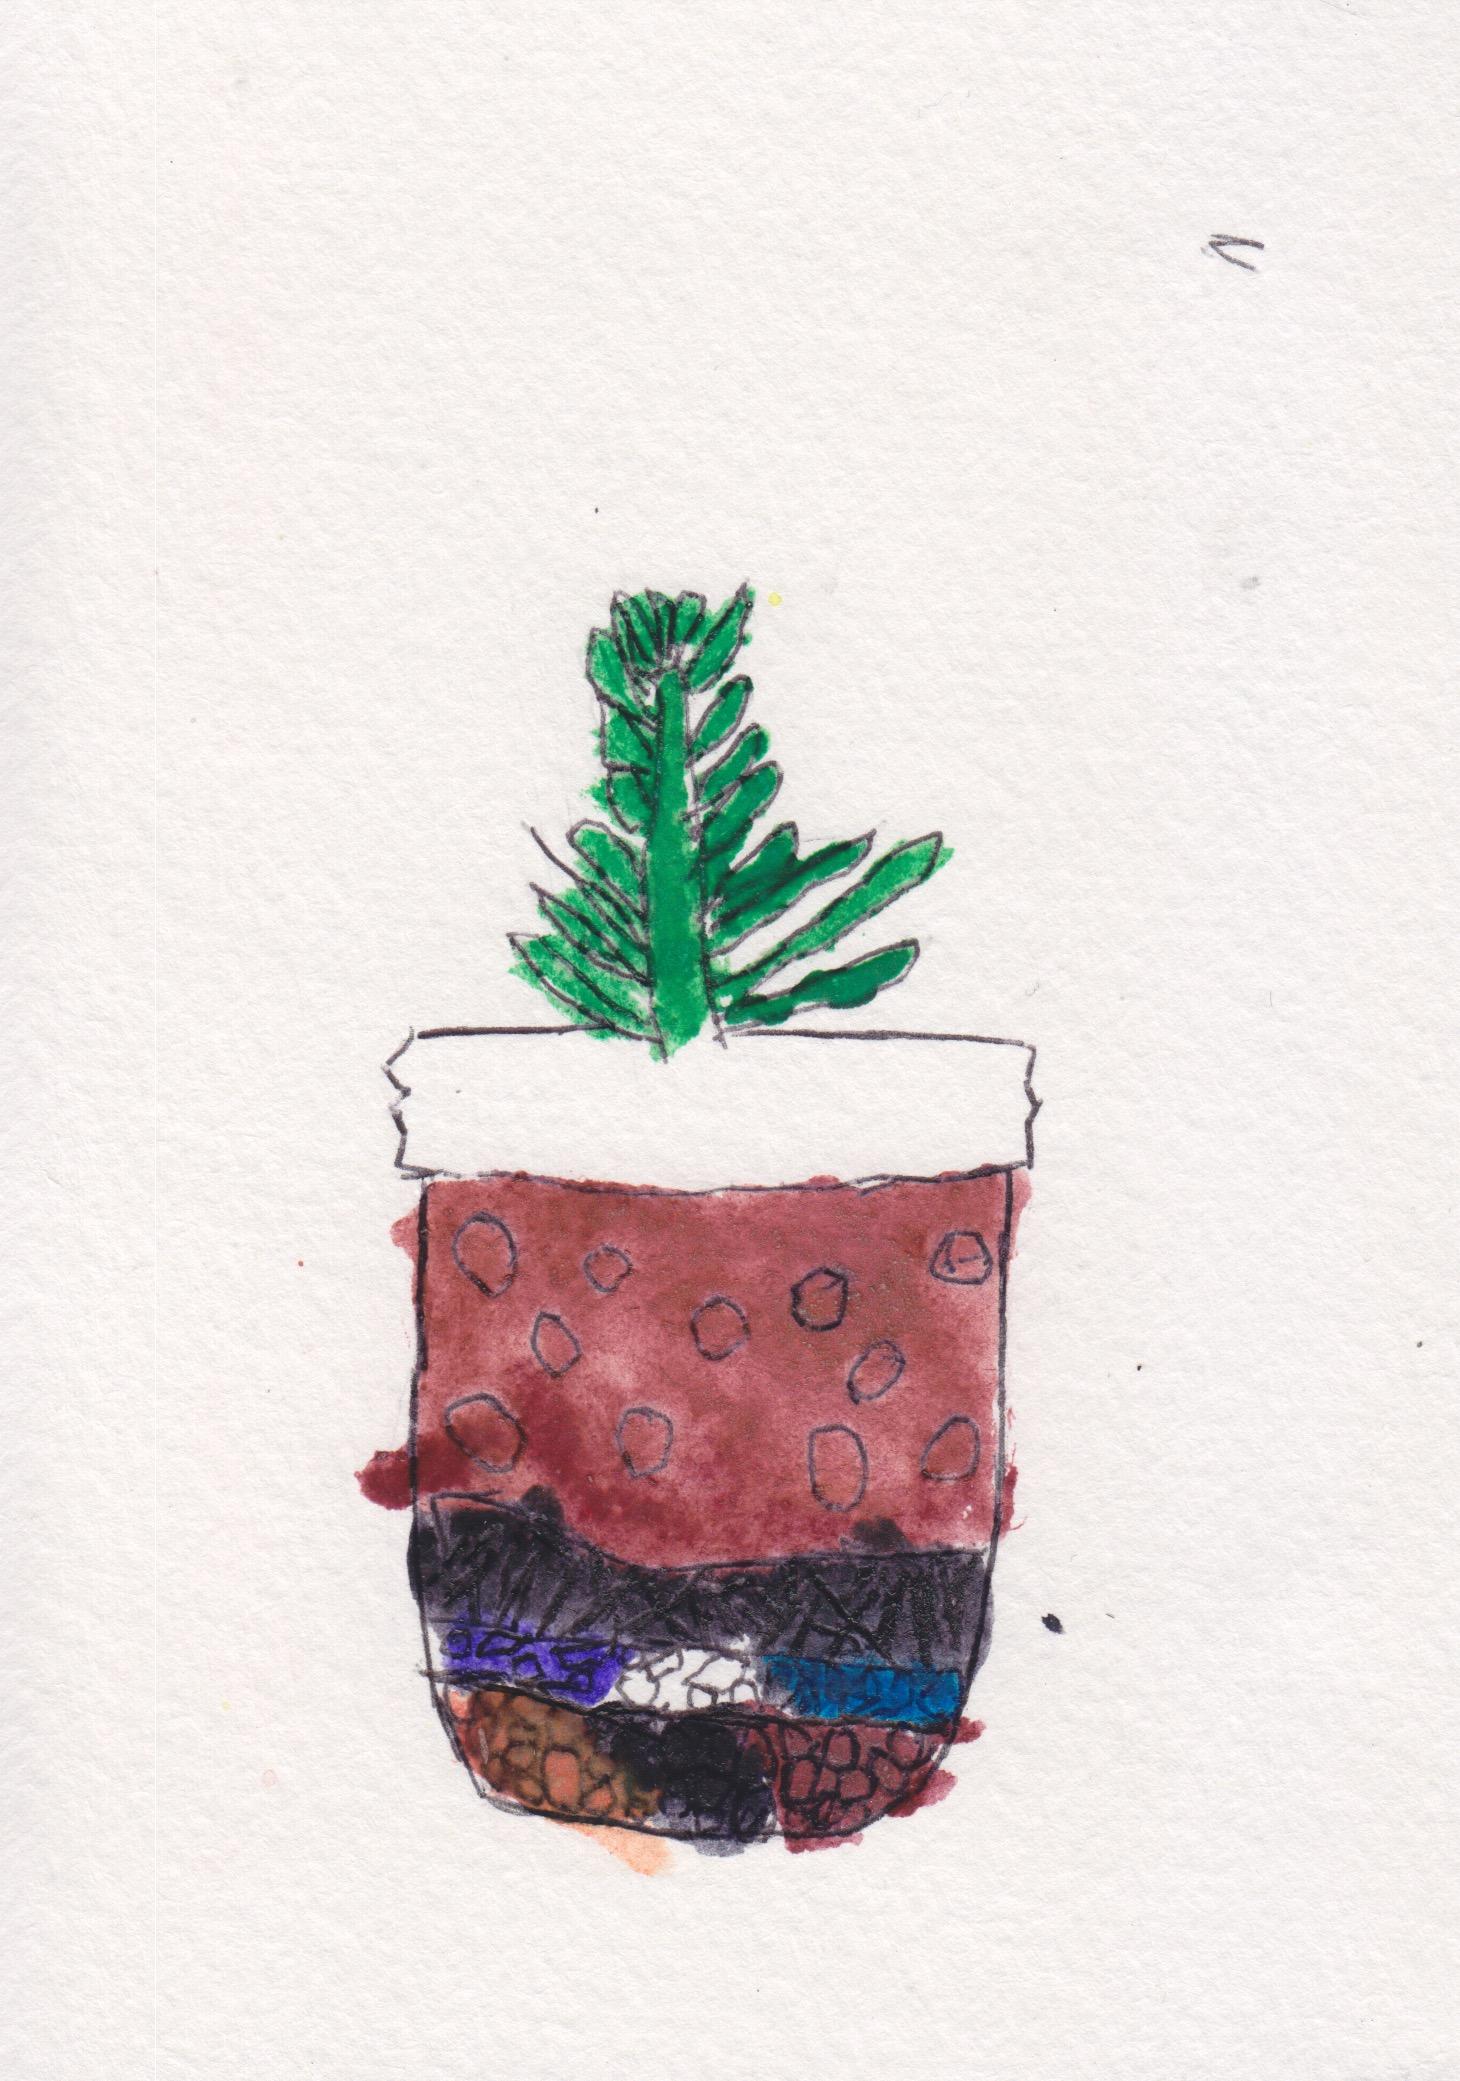 centro_watercolor terrarium_JulianPerez02.jpeg